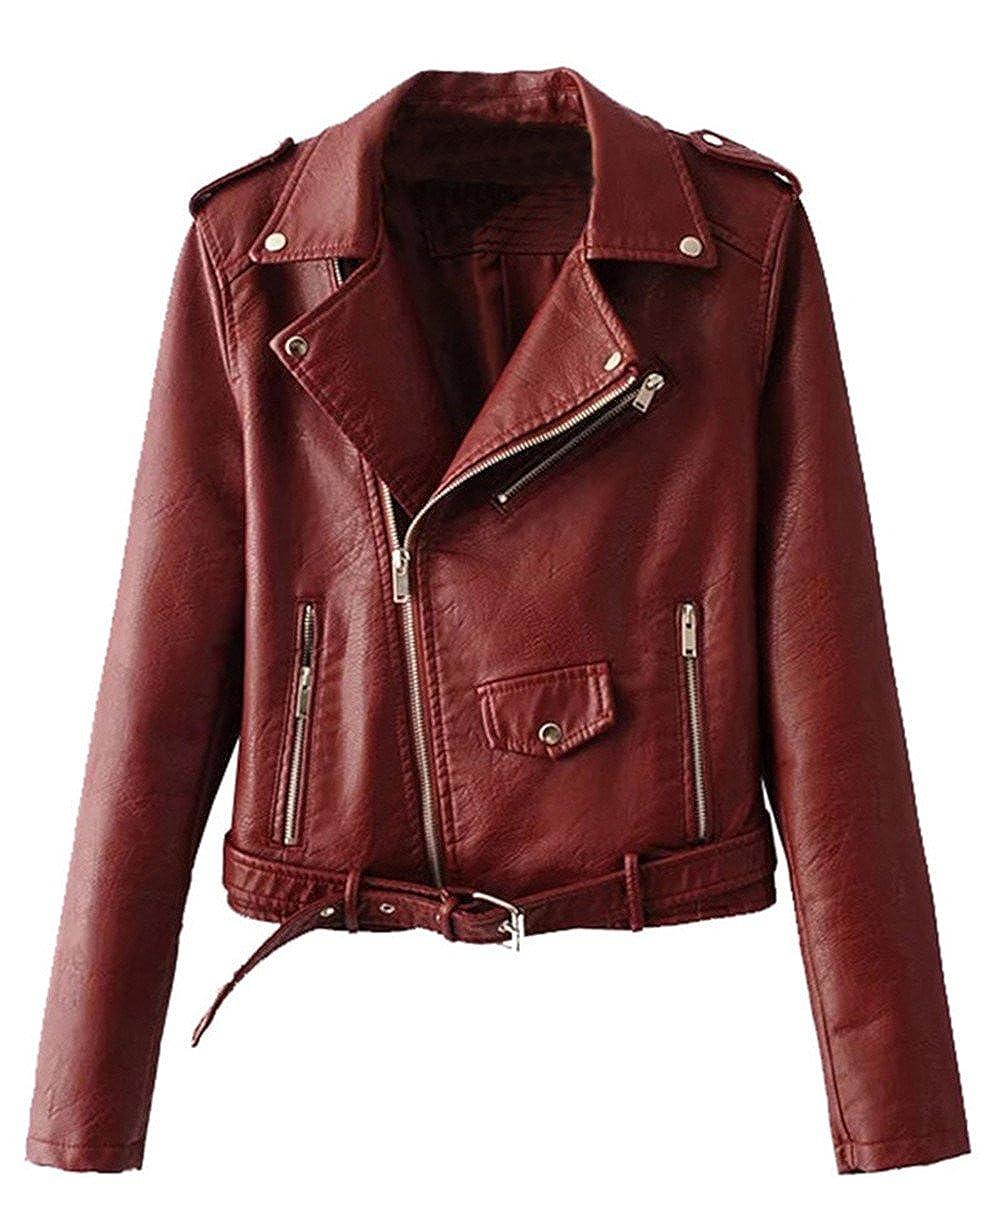 Allonly Women's Faux Leather Diagonal Zipper up Lapel Motorcycle Jacket Coat ALJWJK013